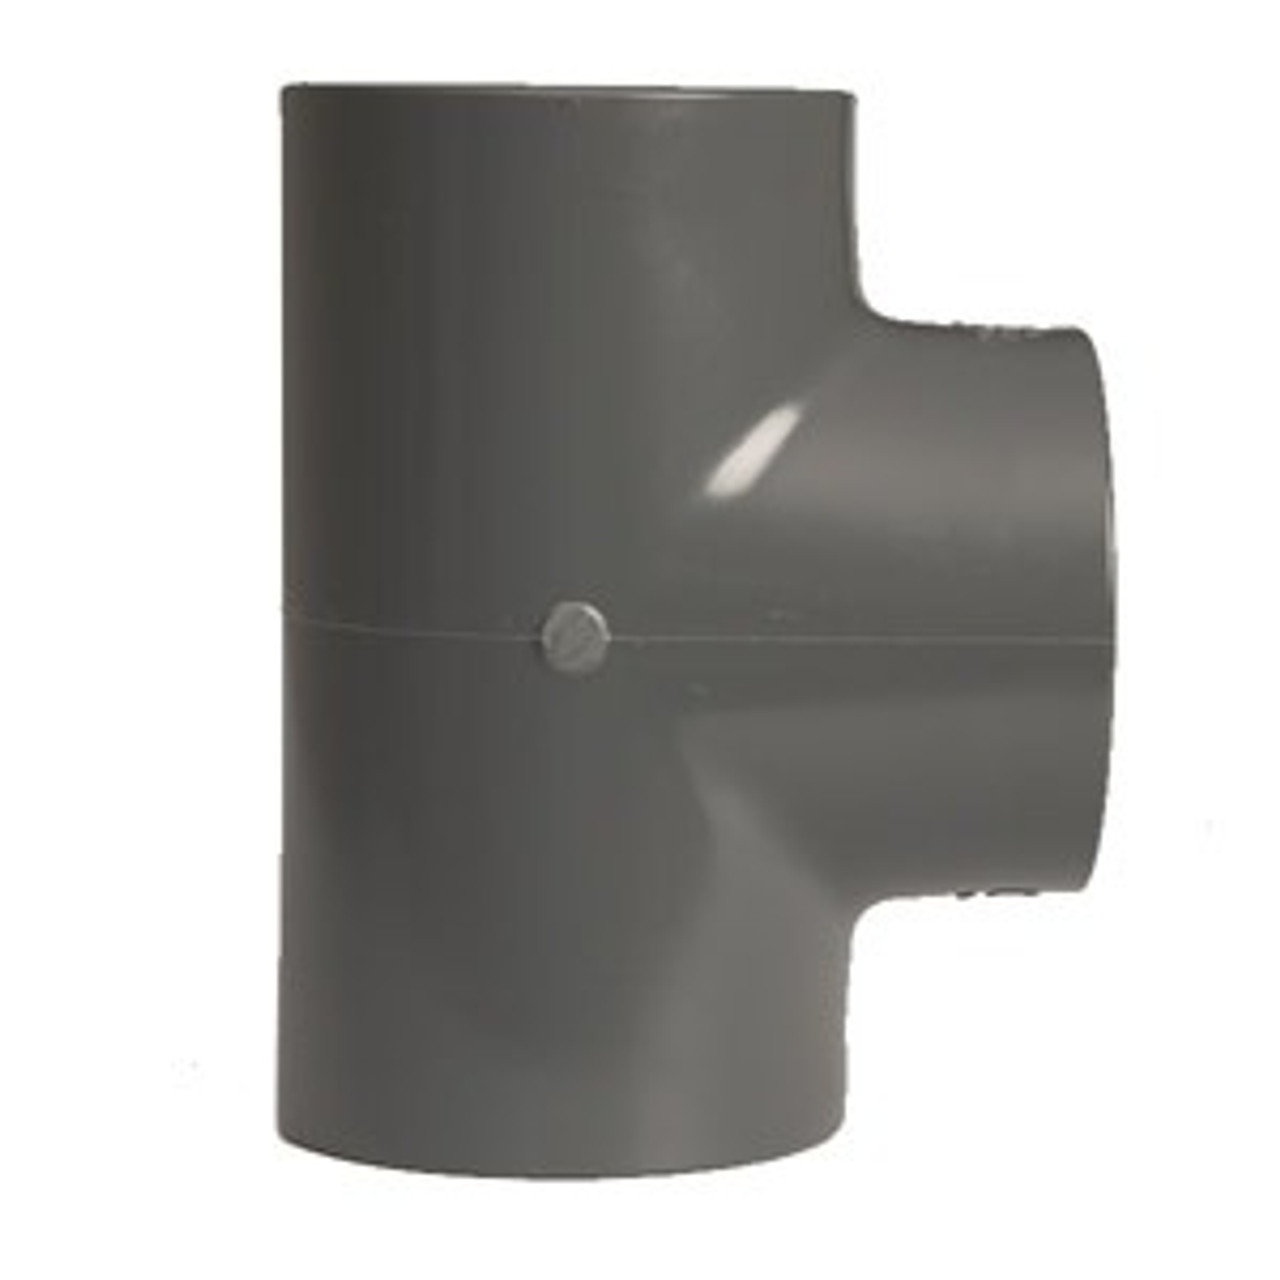 +GF+   Tee 90 Equal PVC-U 20mm (721200106)